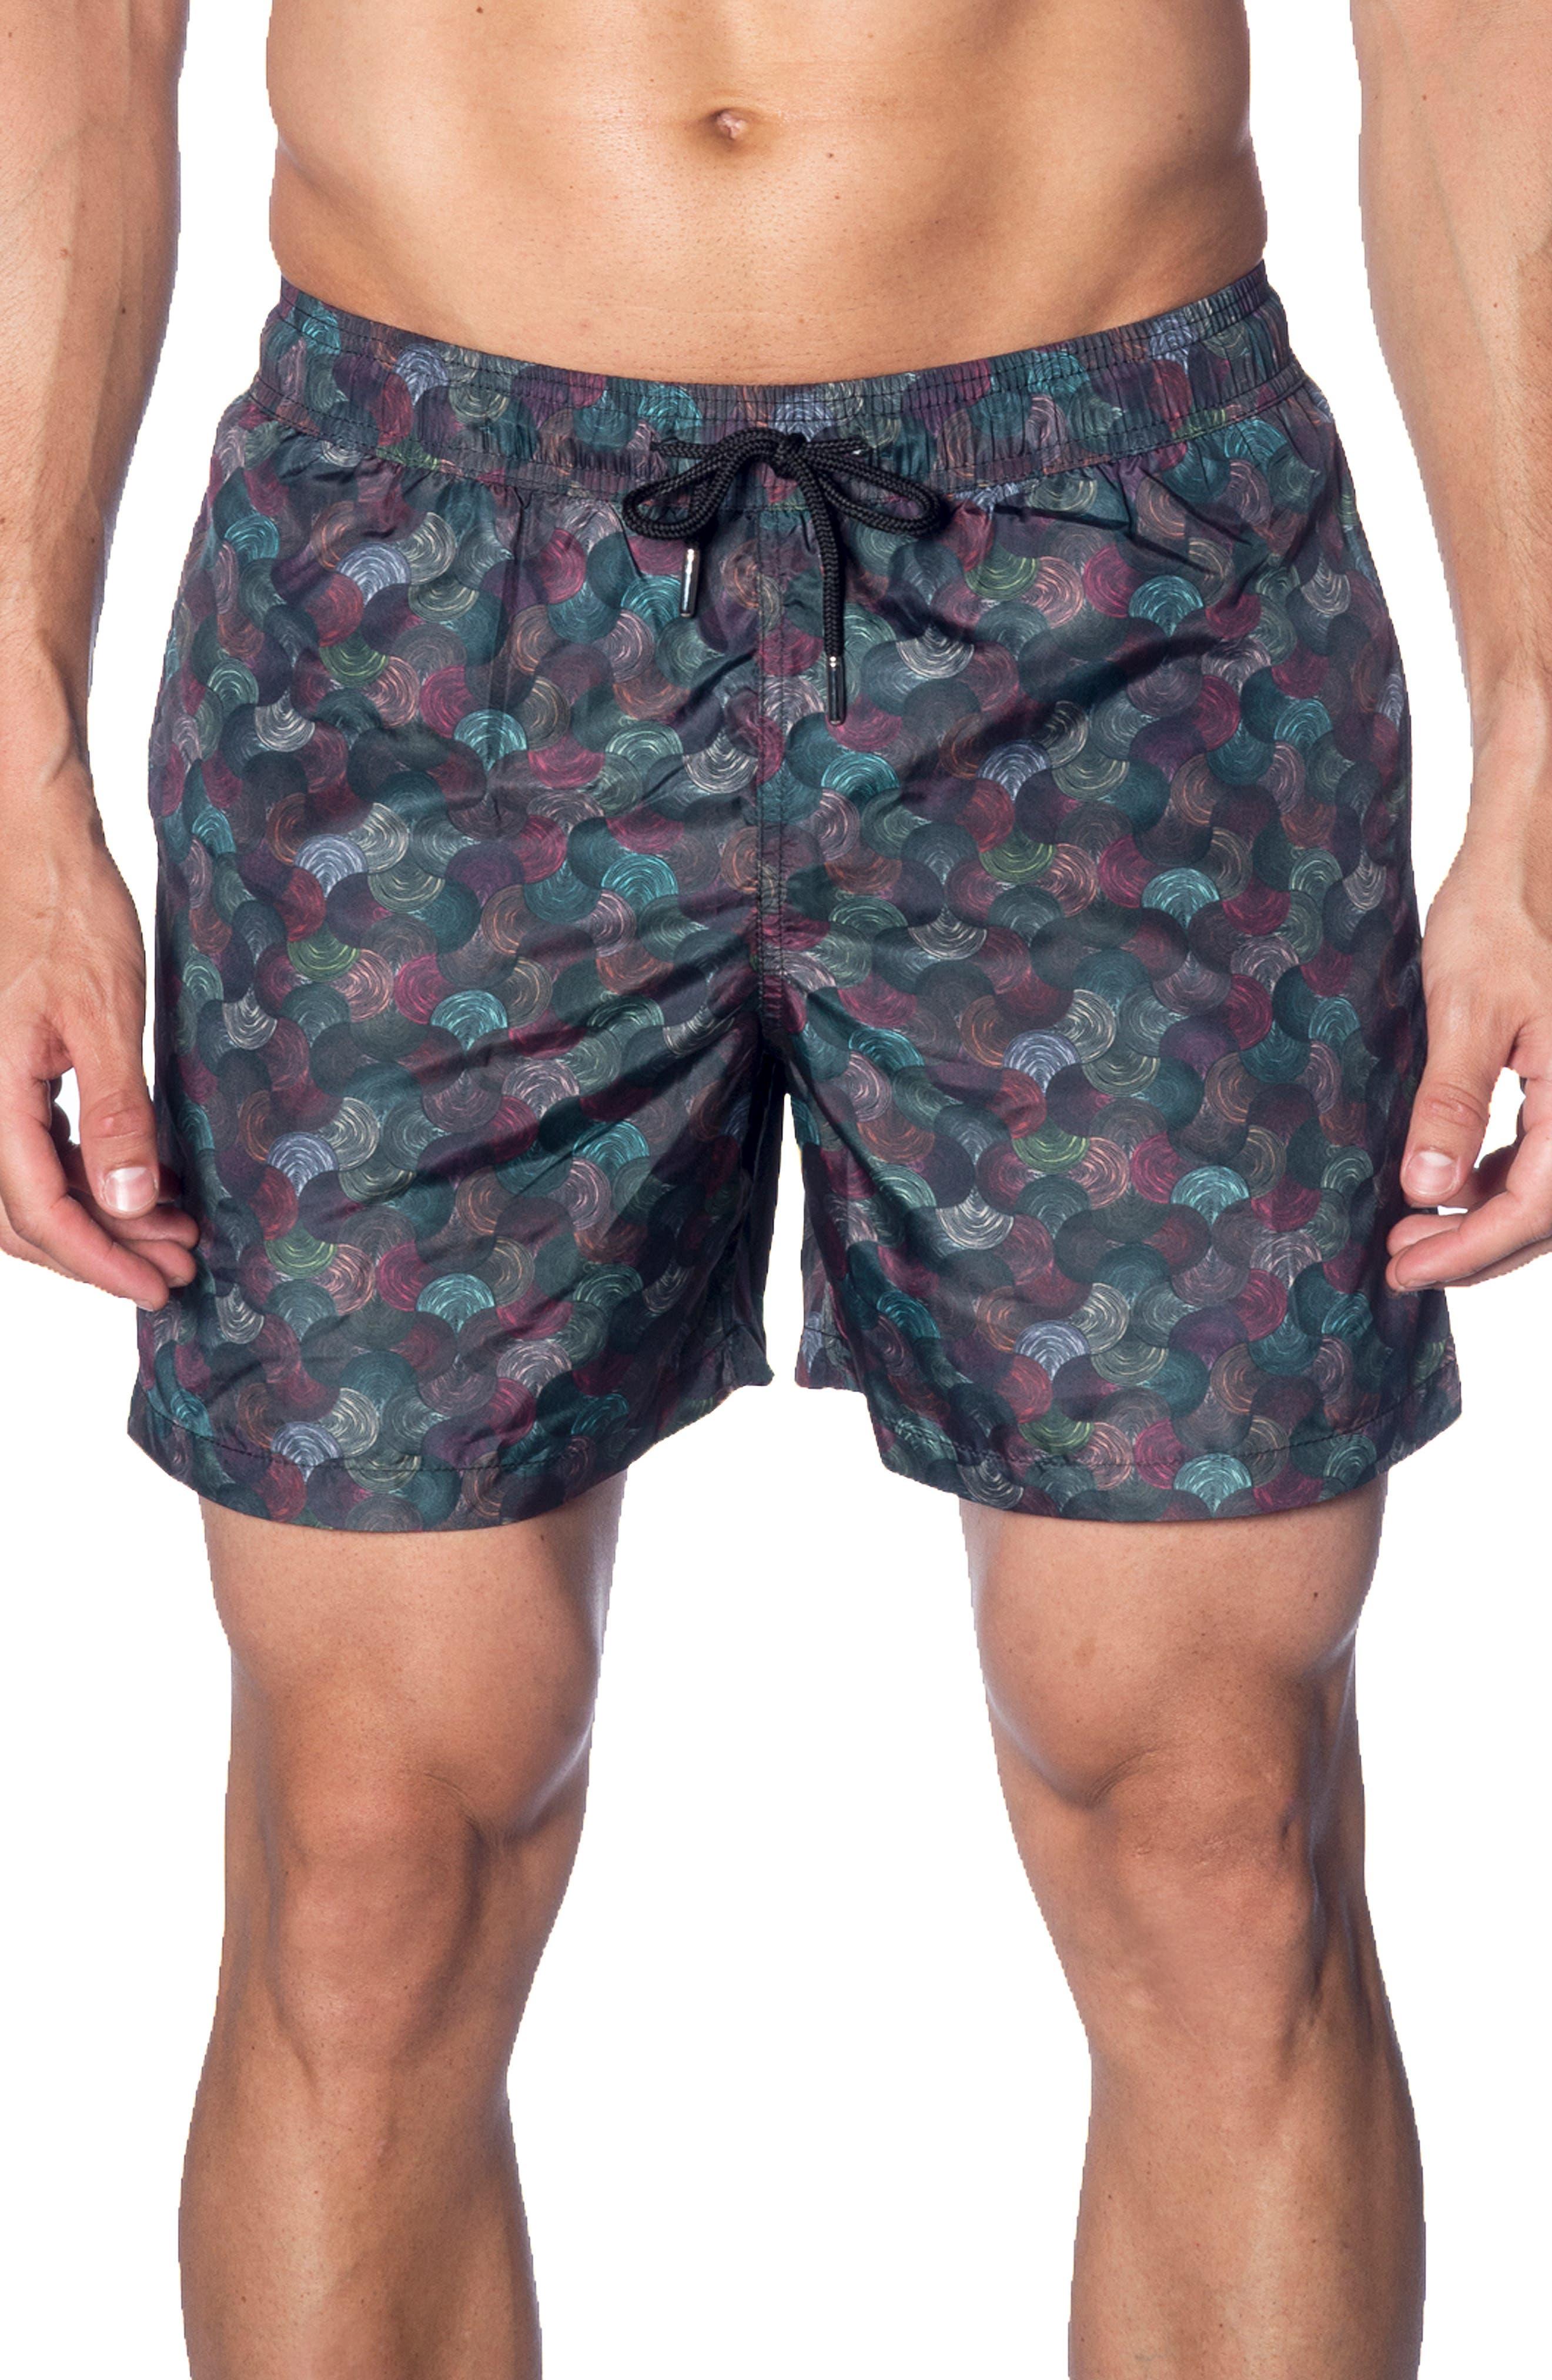 Jared Lang Swim Trunks, Green